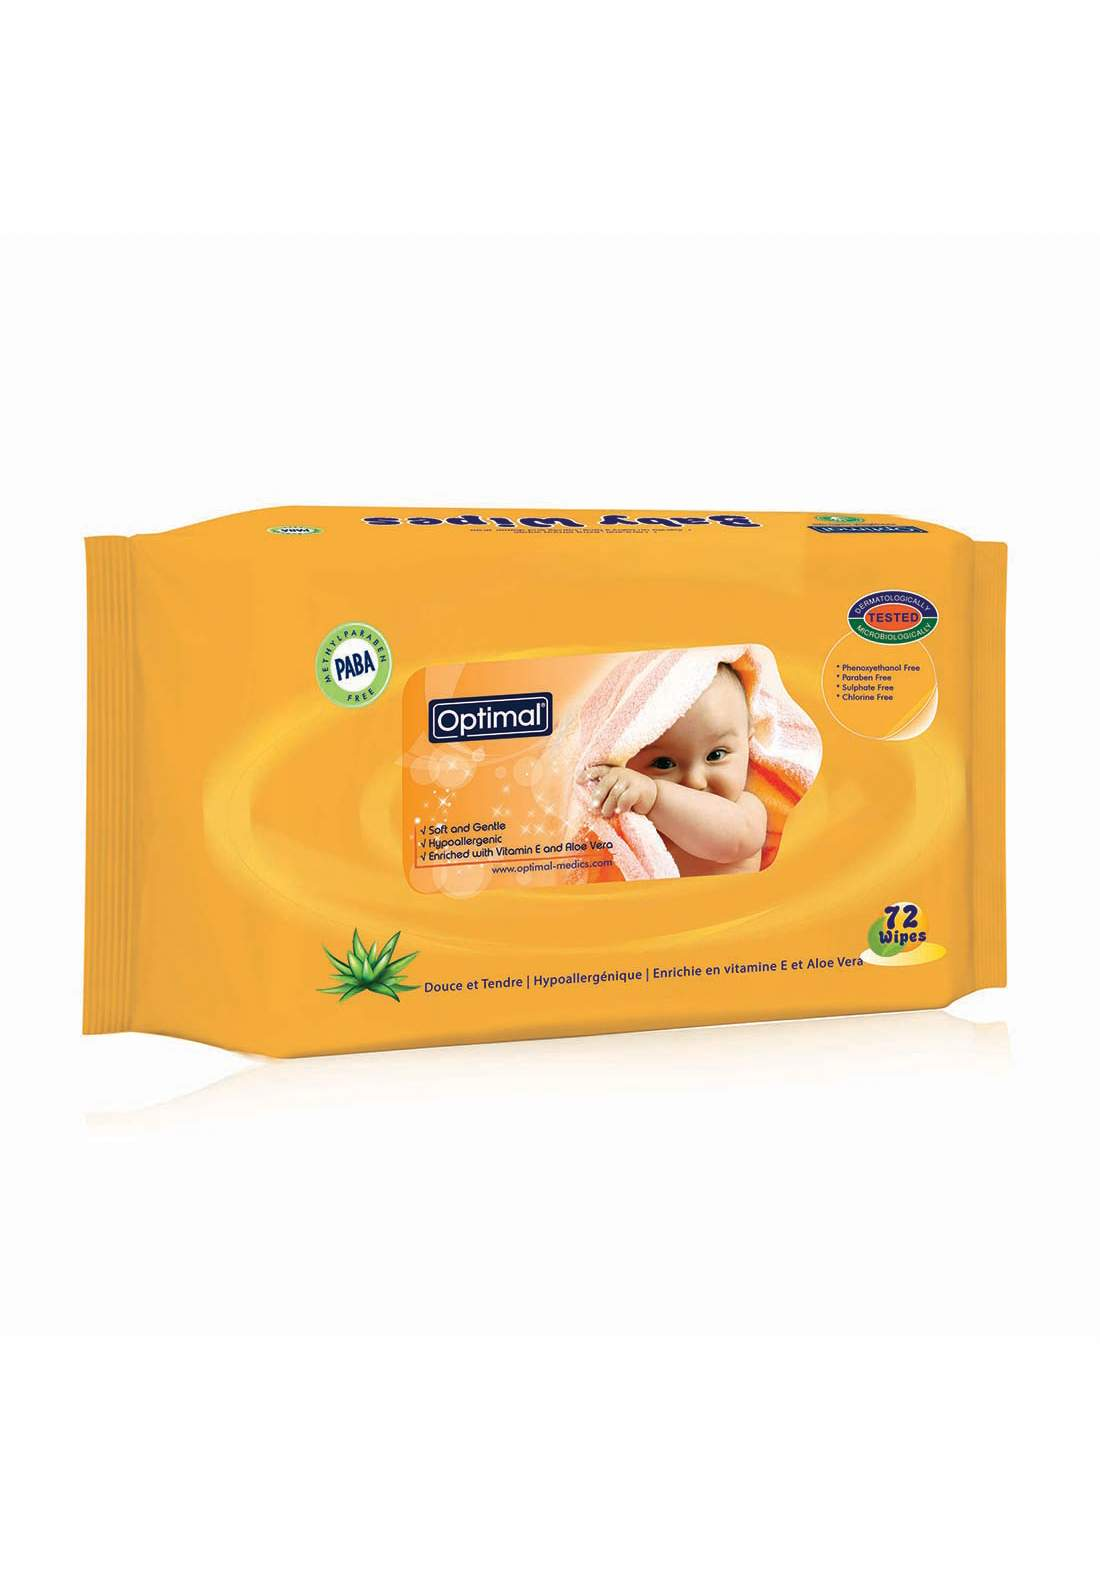 Optimal Vitamin E and Aloe Vera Baby Wipes   72pcs (0-6m)مناديل معطرة للبشرة الحساسة  للاطفال